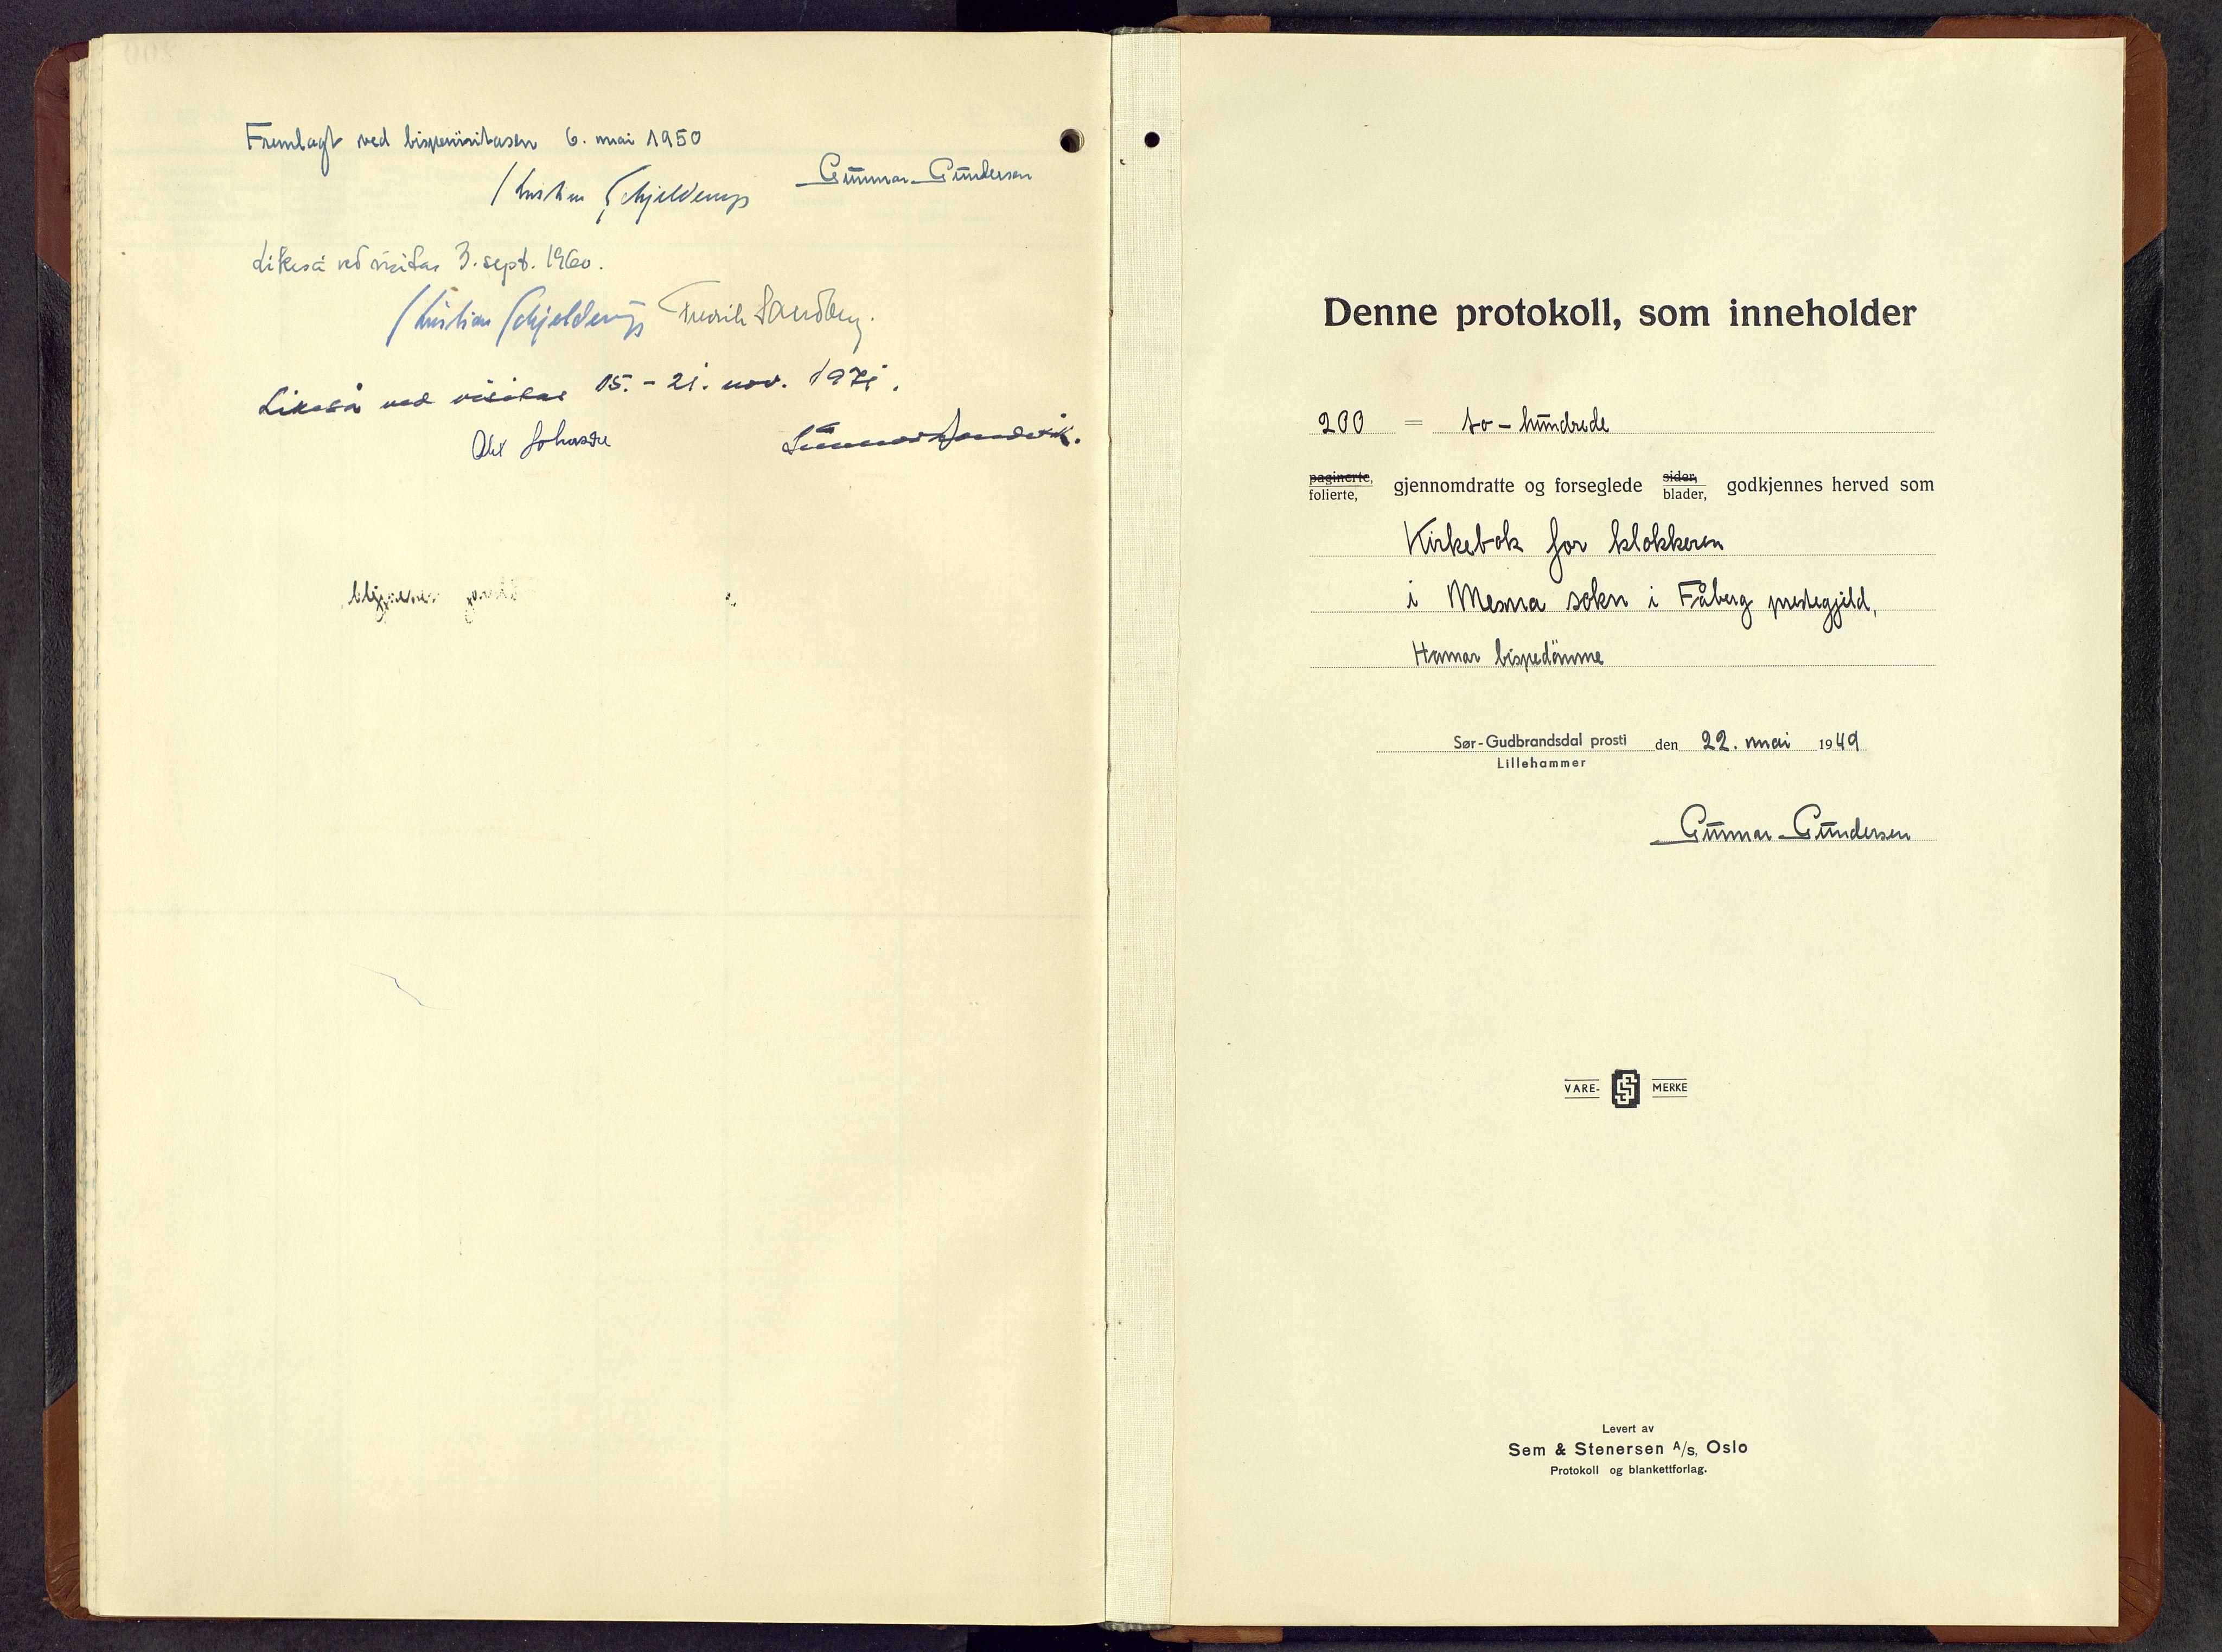 SAH, Fåberg prestekontor, H/Ha/Hab/L0019: Klokkerbok nr. 19, 1949-1968